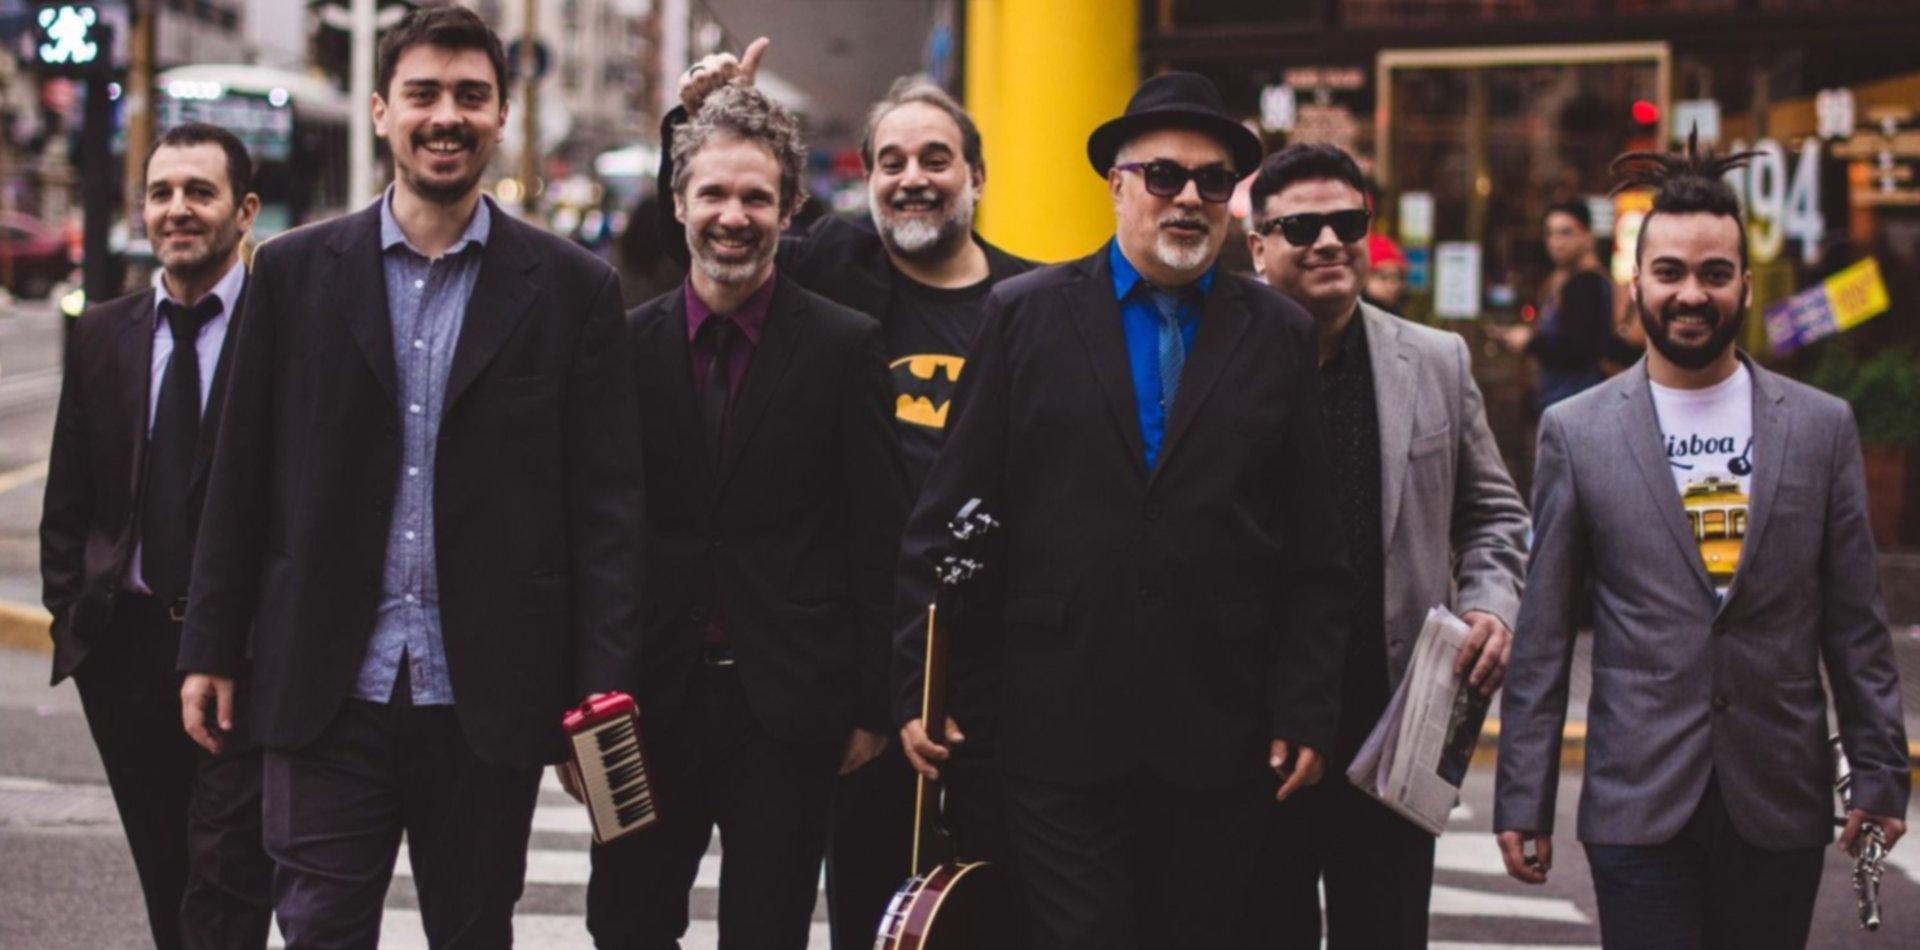 La primavera tiene swing: la Orquesta Brazofuerte y Swing Out Studio juntos en La Plata